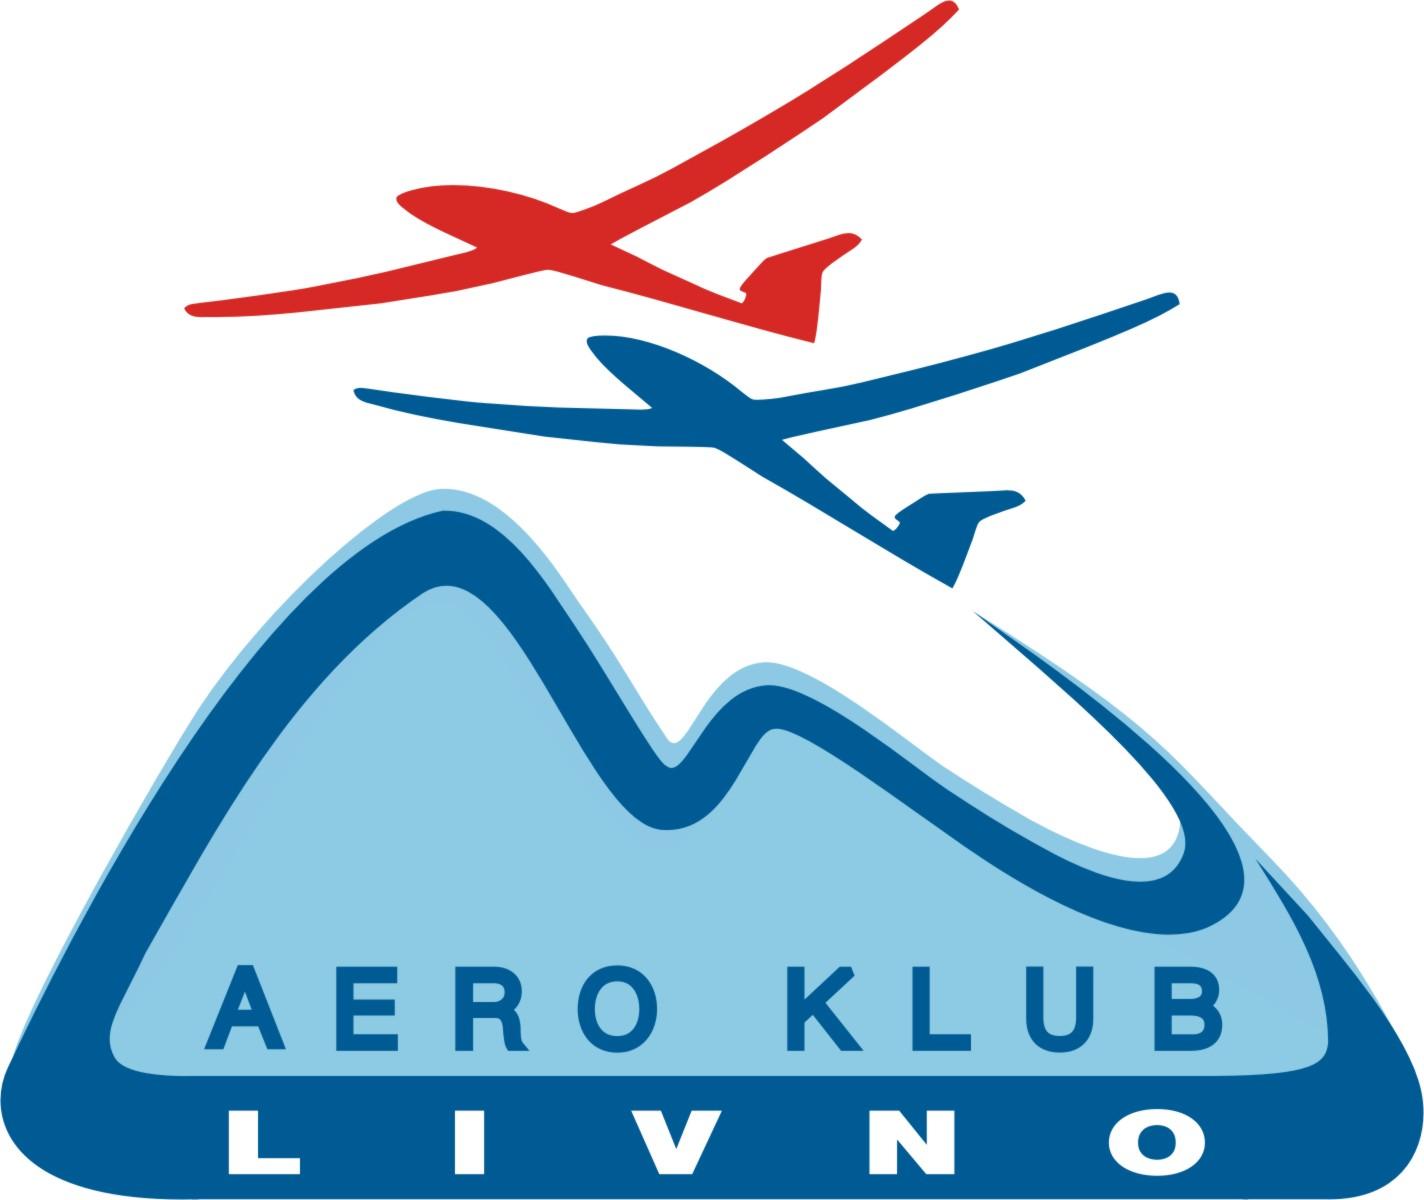 Aeroklub Livno